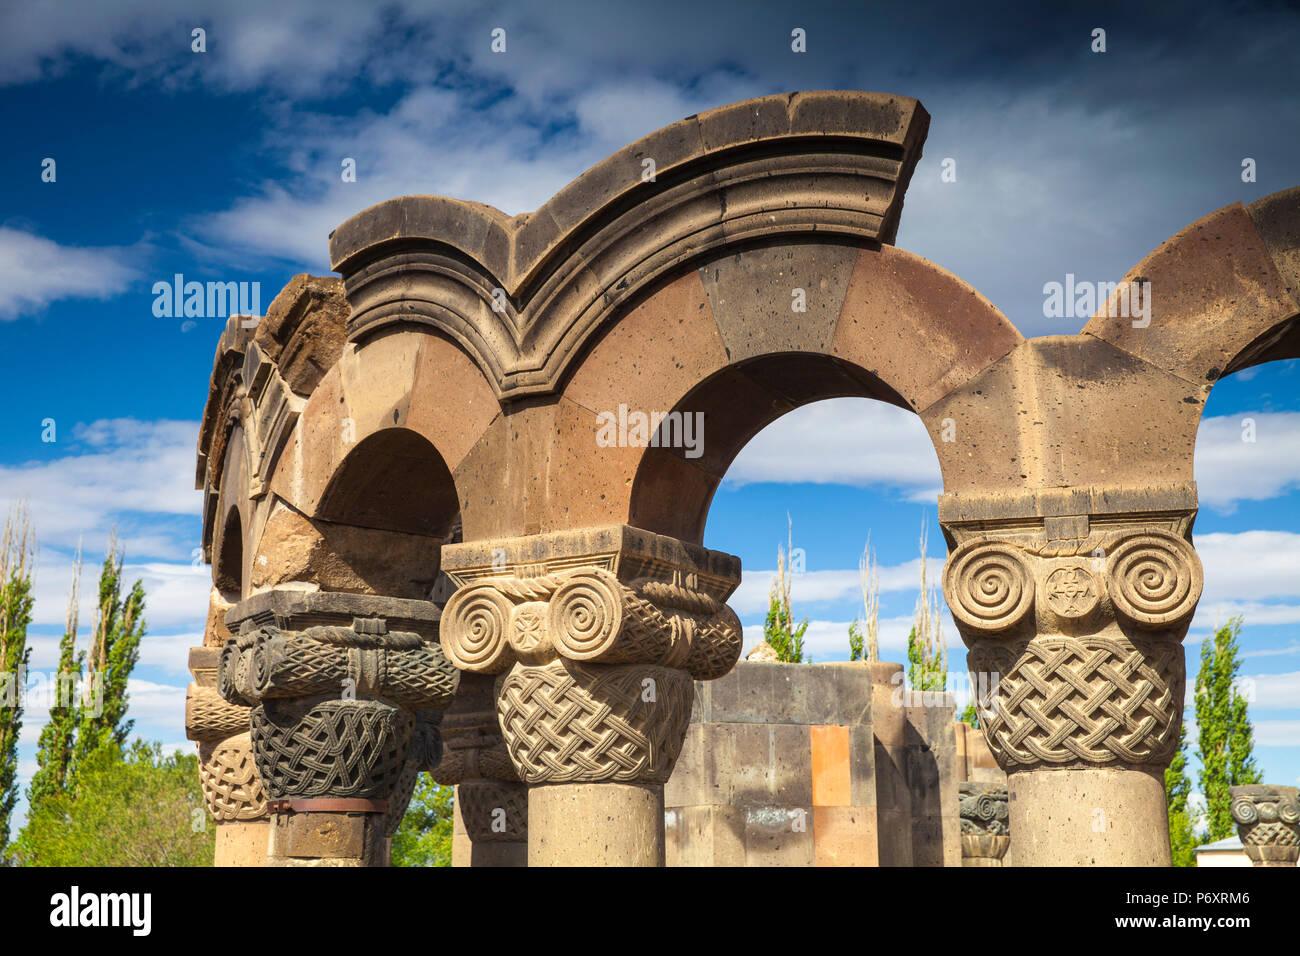 Arménia, Yerevan, Catedral de zvartnots Imagens de Stock